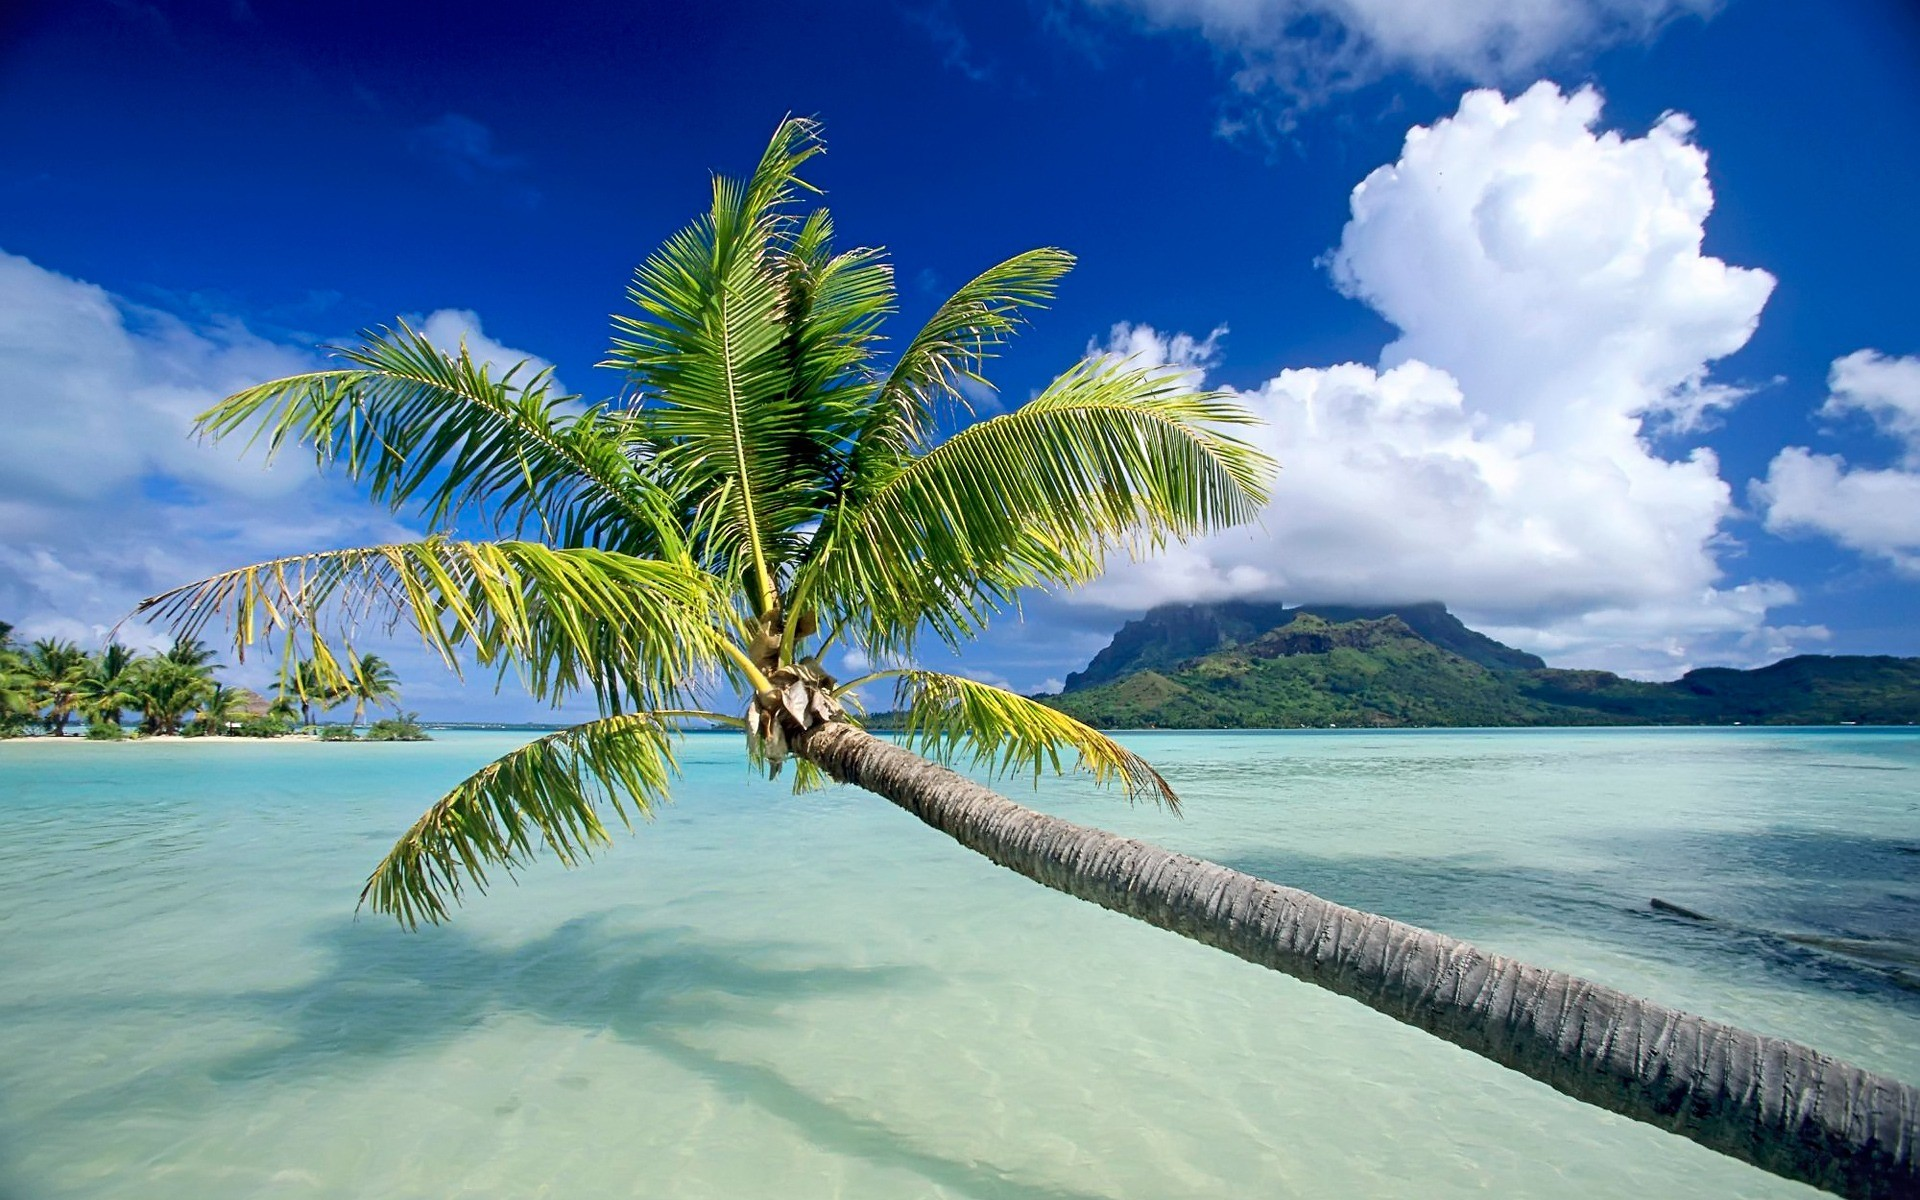 30 HD Tropical Beach Backgrounds #7256